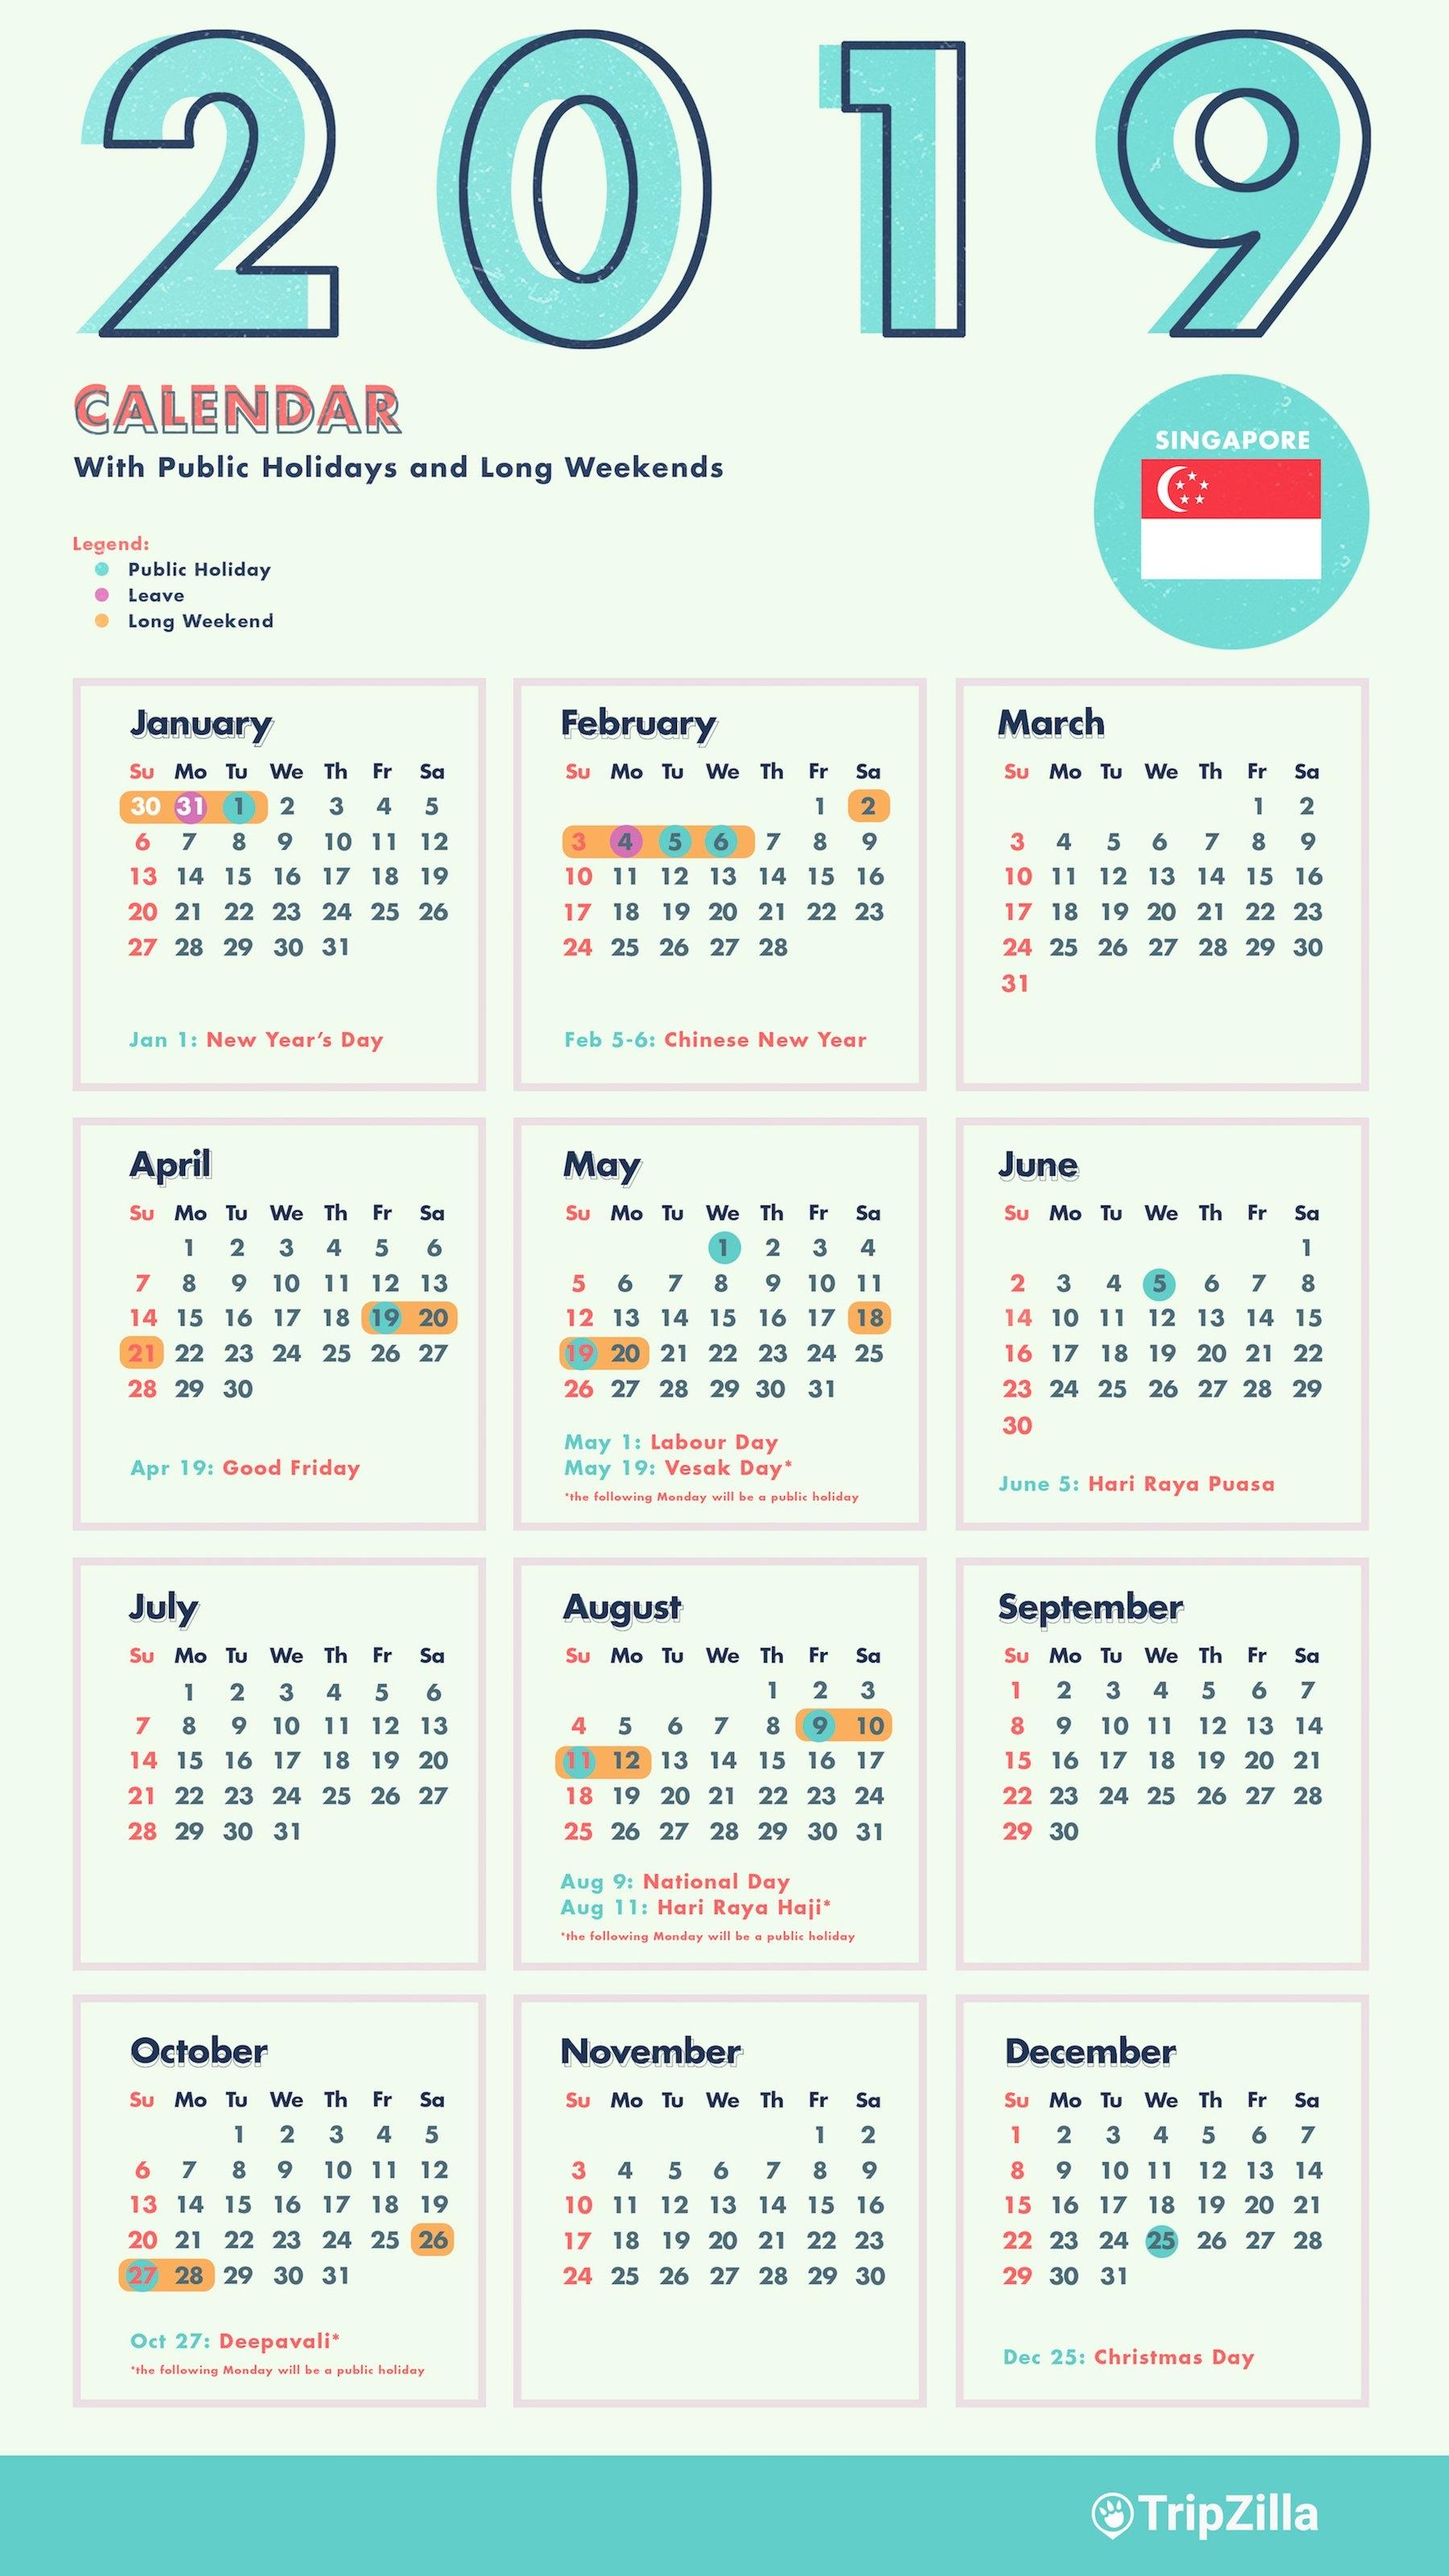 6 Long Weekends In Singapore In 2019 (Bonus Calendar & Cheatsheet) Calendar 2019 With All Holidays